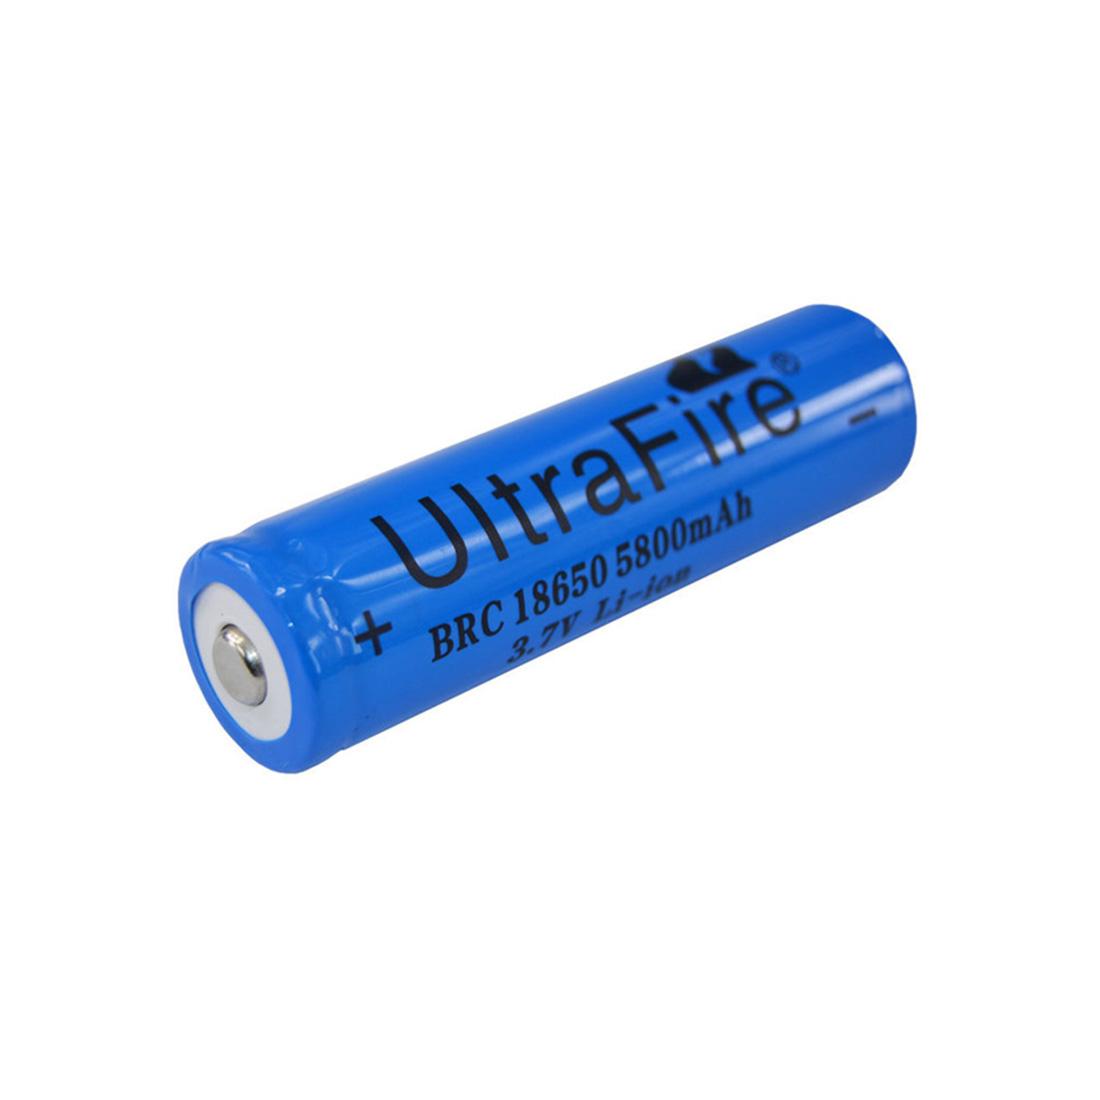 GH 18650 típusú, Li-ion akkumulátor 5800mAh